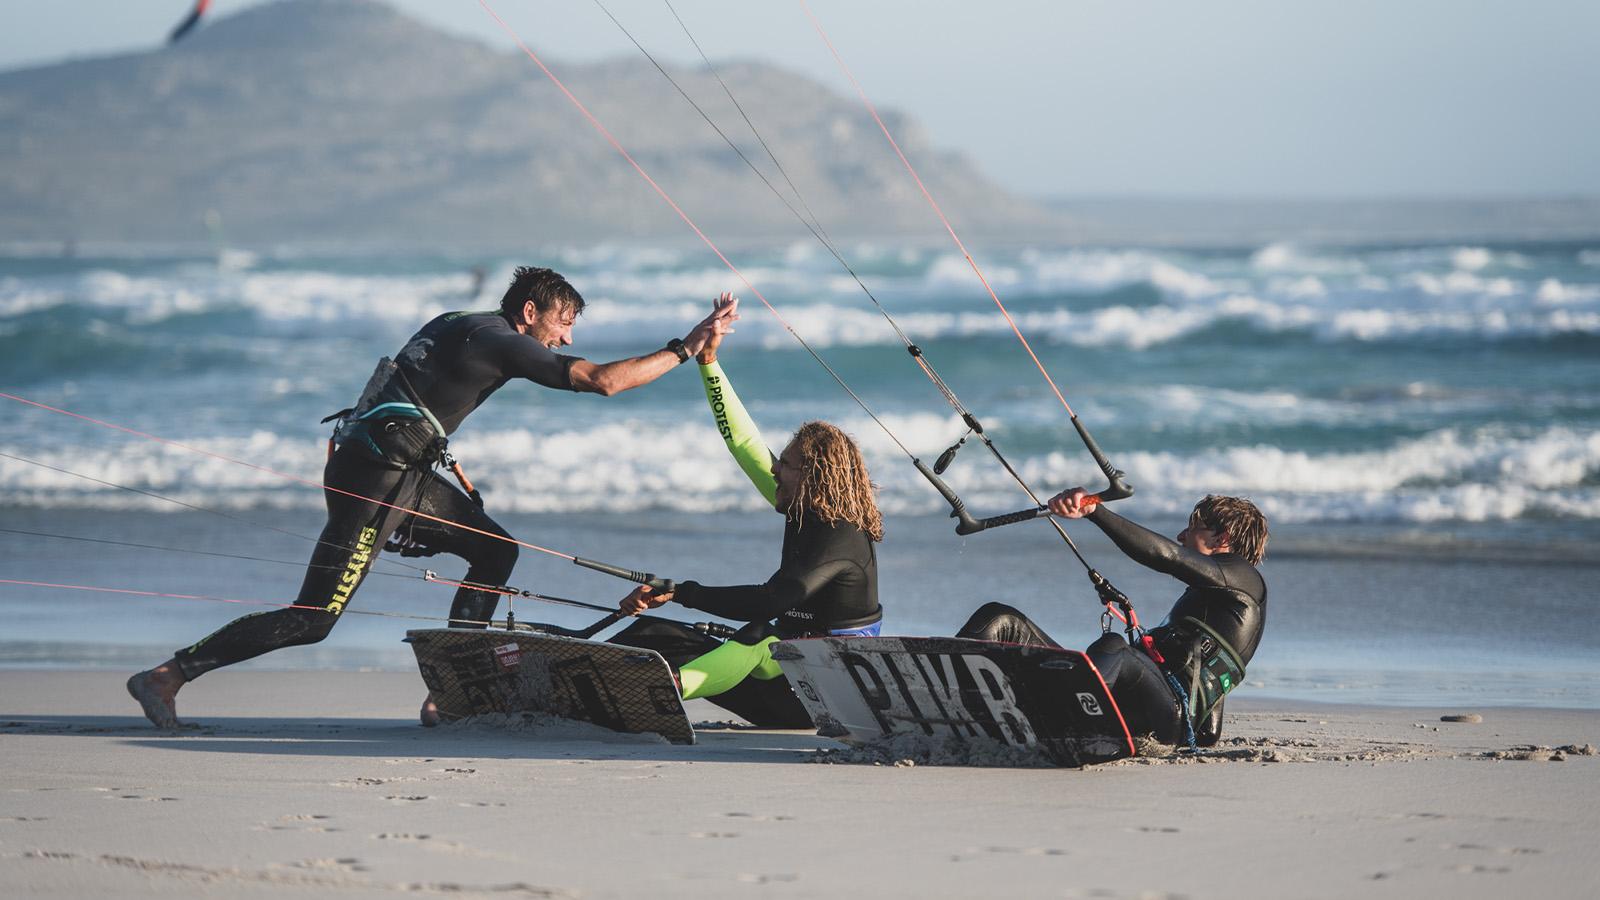 Peter Lynn Kiteboarding SS21 Kites